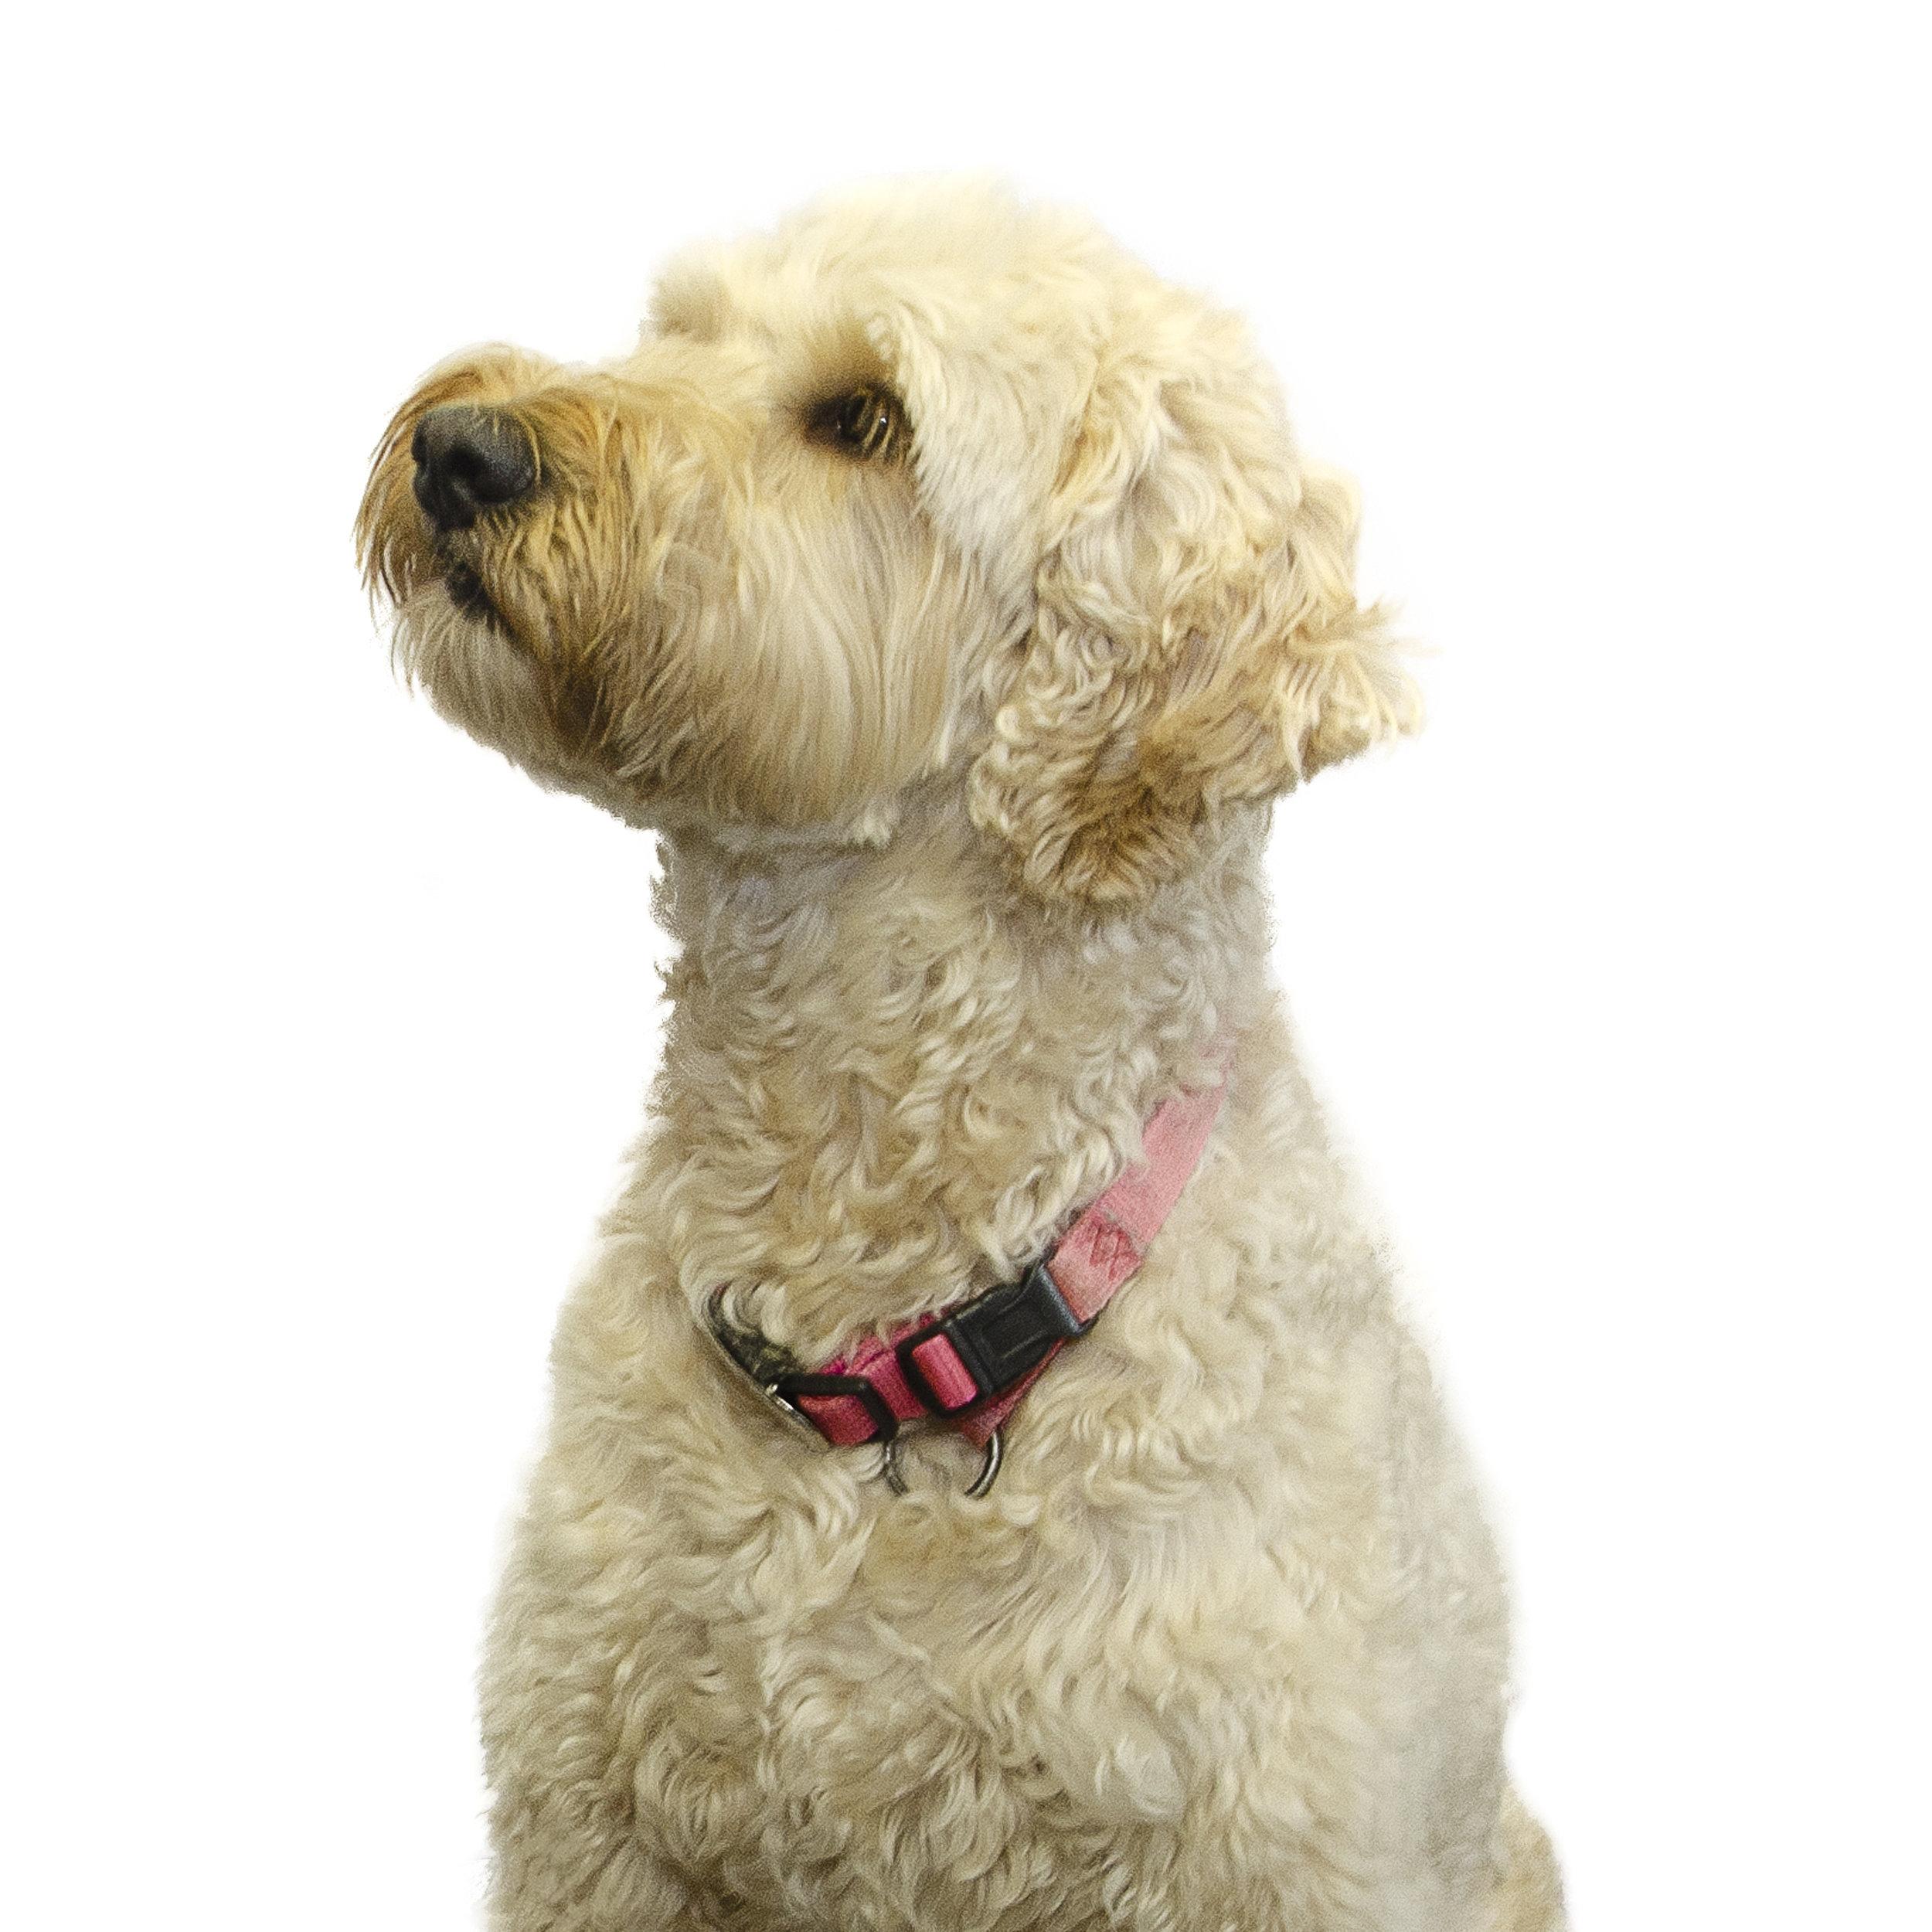 Nola • Waverly Mascot<br>ABA / Behavior Therapy